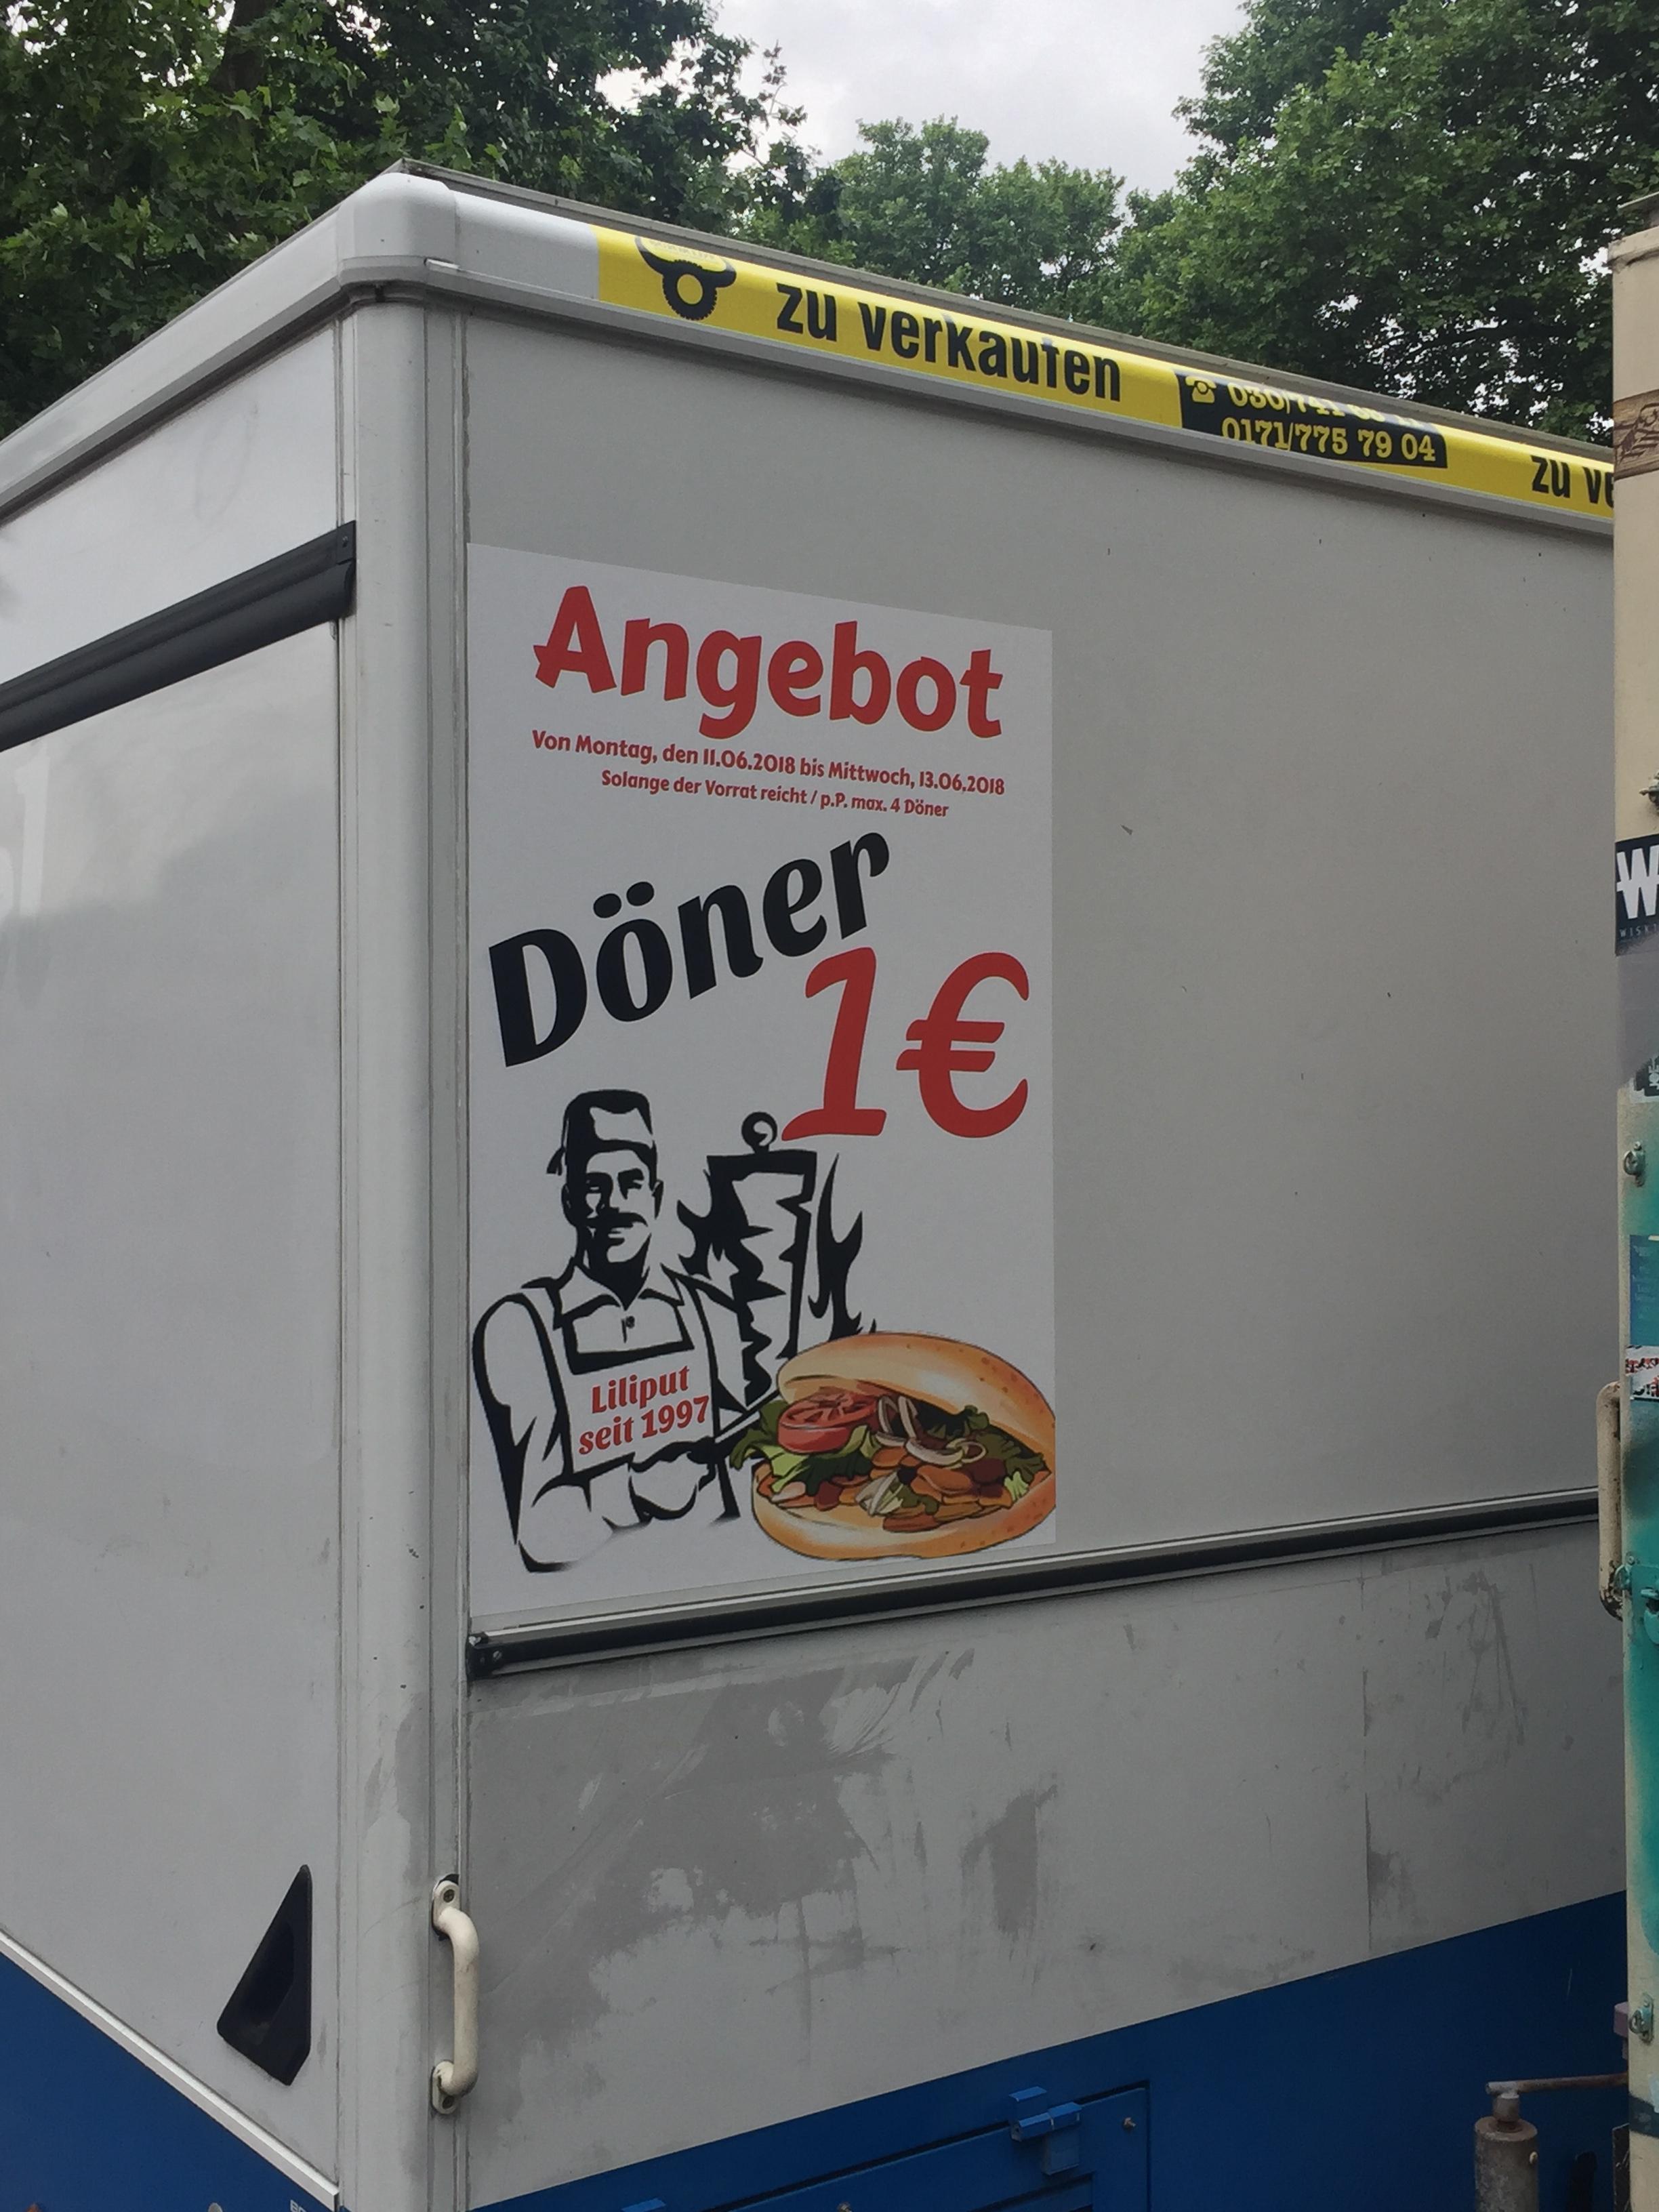 Döner für 1€ [LOKAL - S Treptower Park, Berlin]